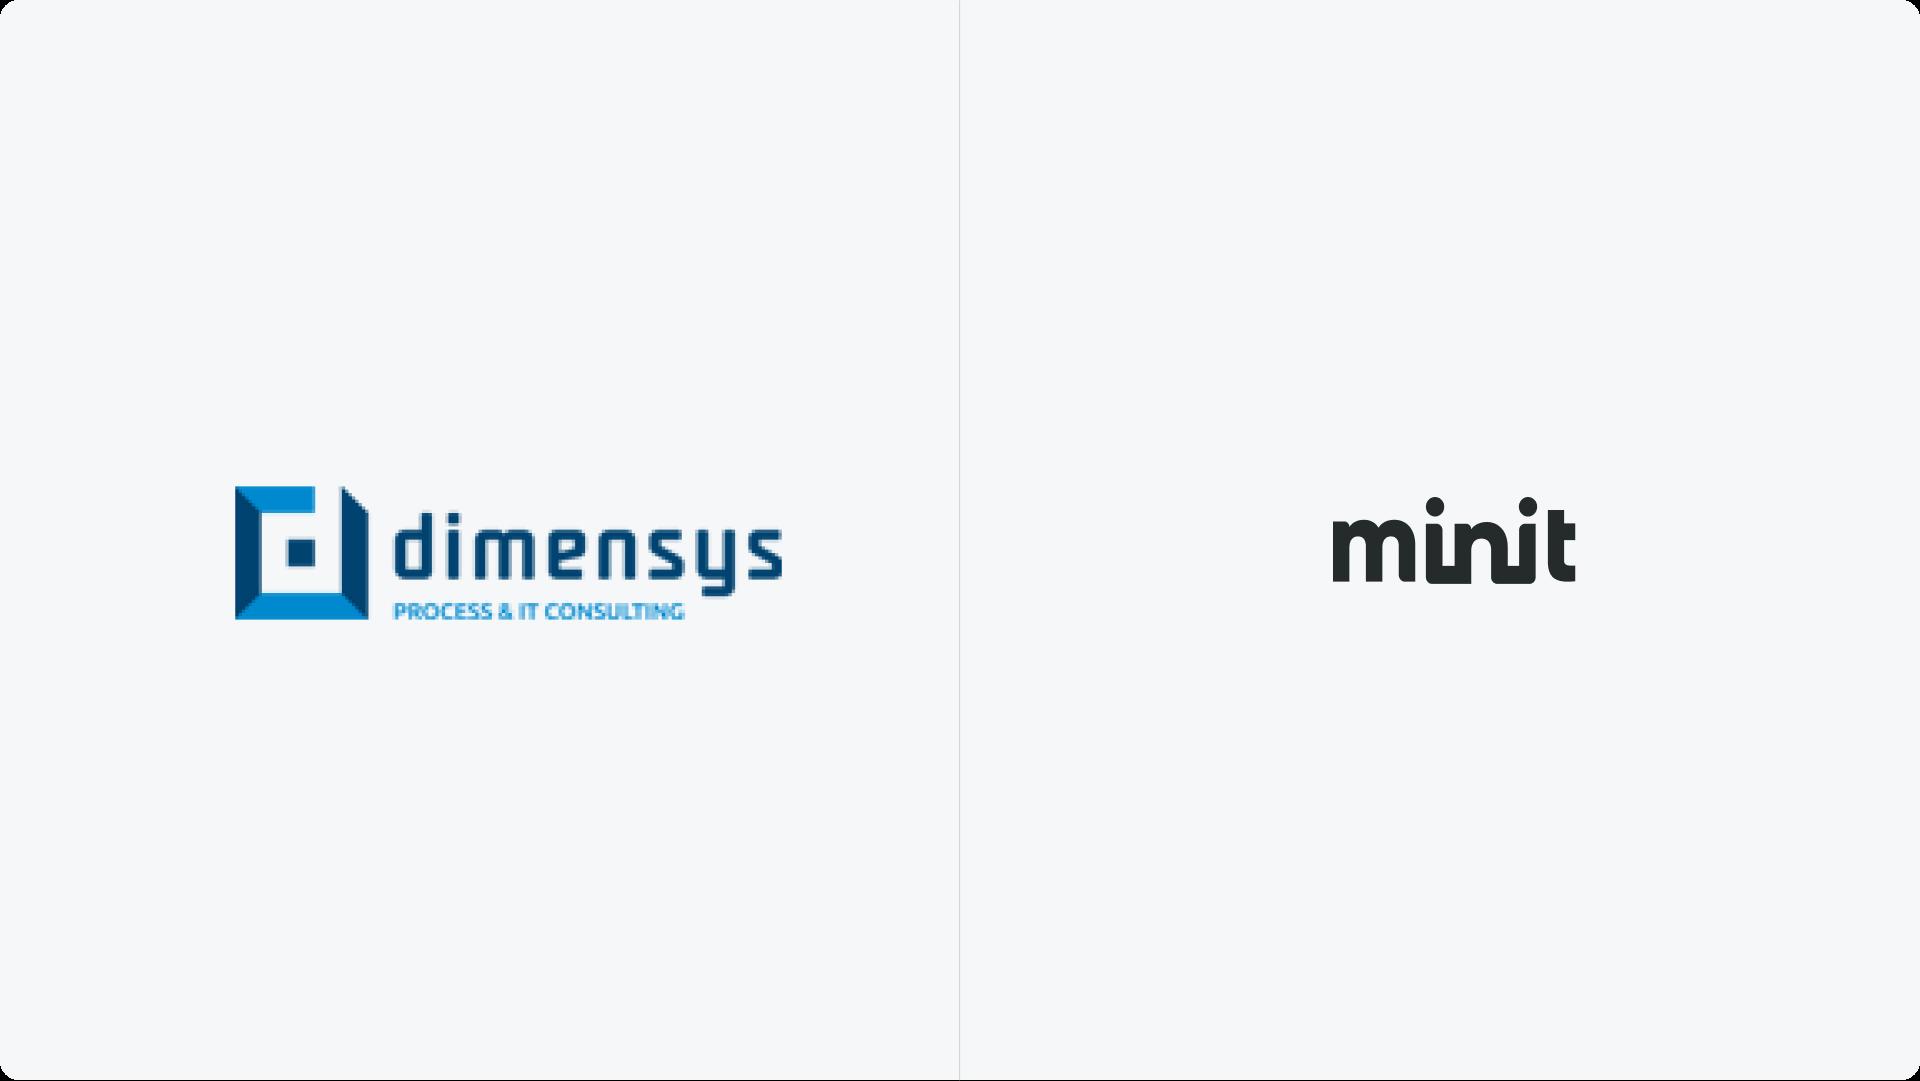 dimensys_minit_cover_blog